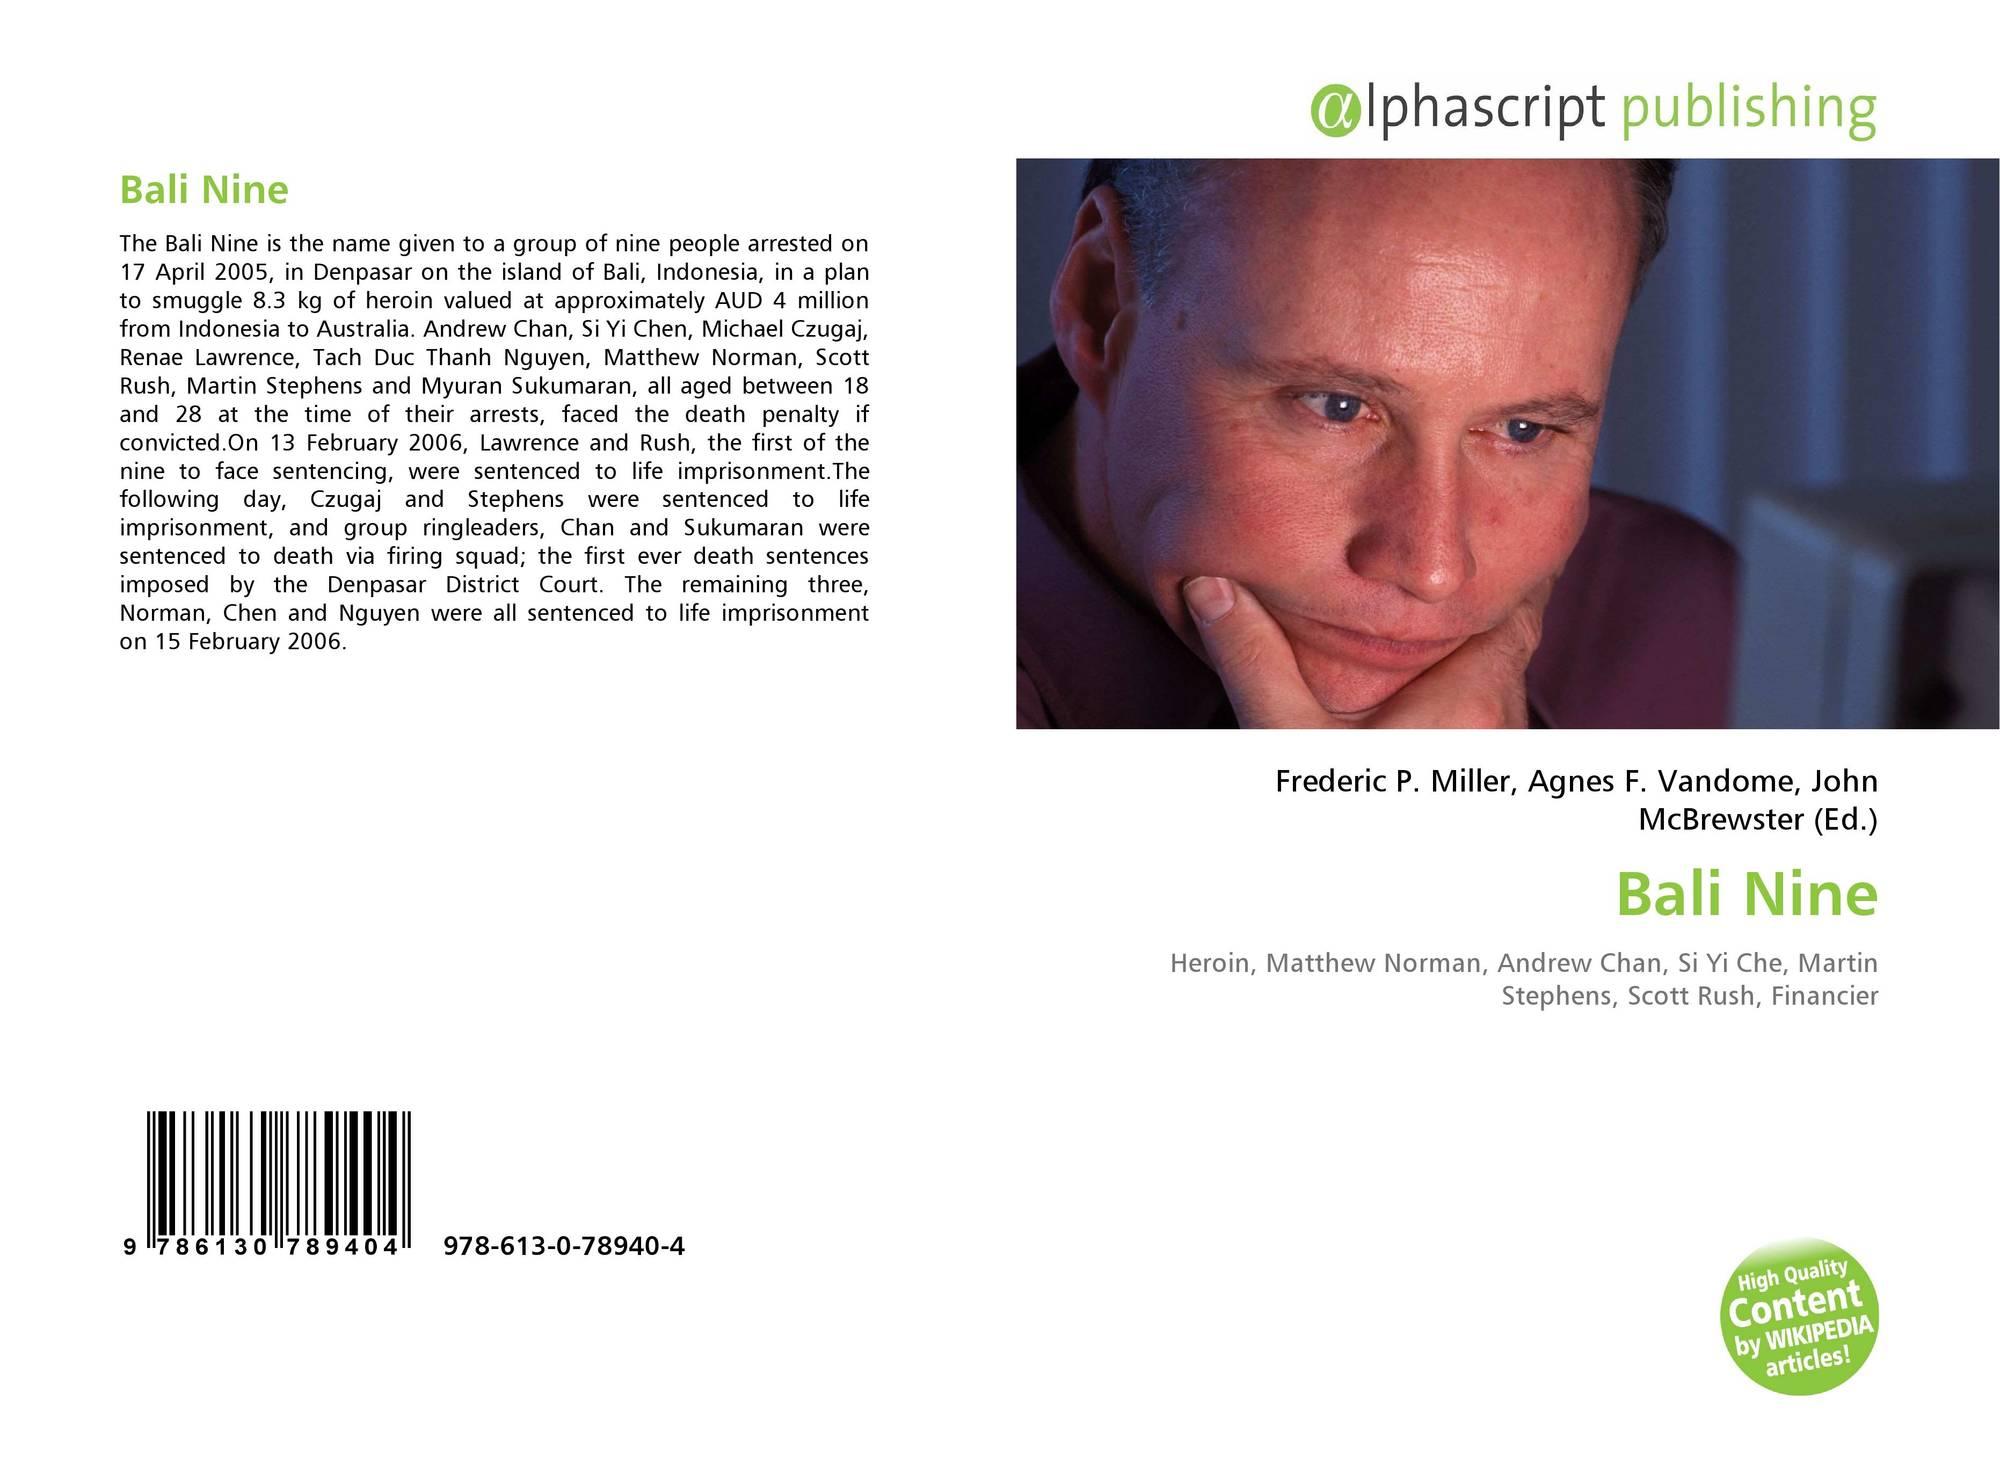 Bali Nine, 978-613-0-78940-4, 6130789408 ,9786130789404